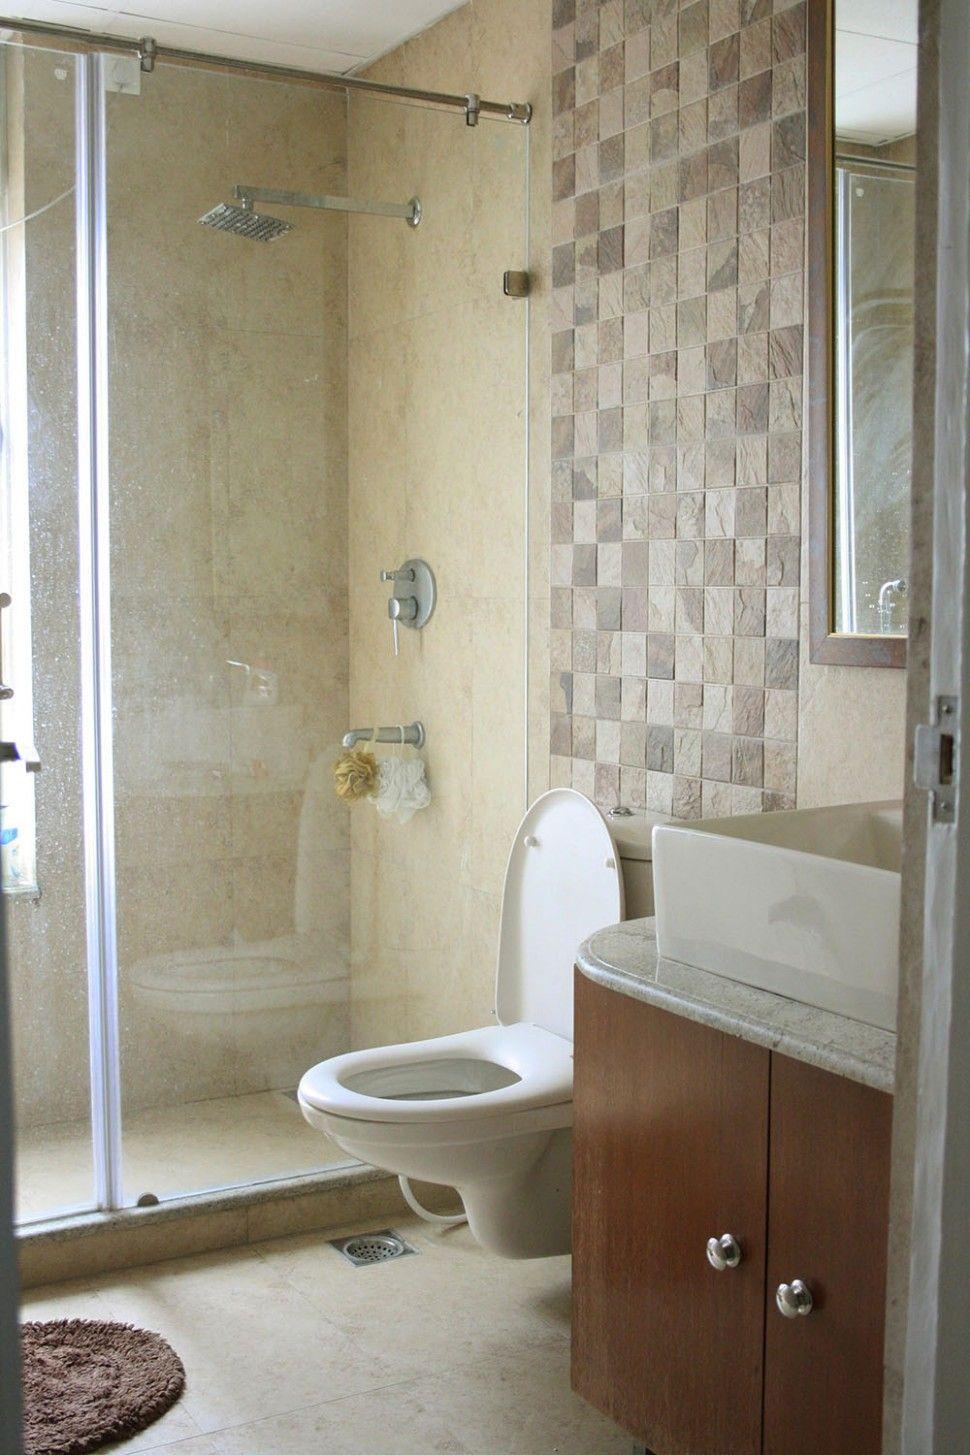 Bathroom Wall Tiles Highlighter In 2020 Bathroom Wall Tile Mosaic Bathroom Tile Tile Bathroom